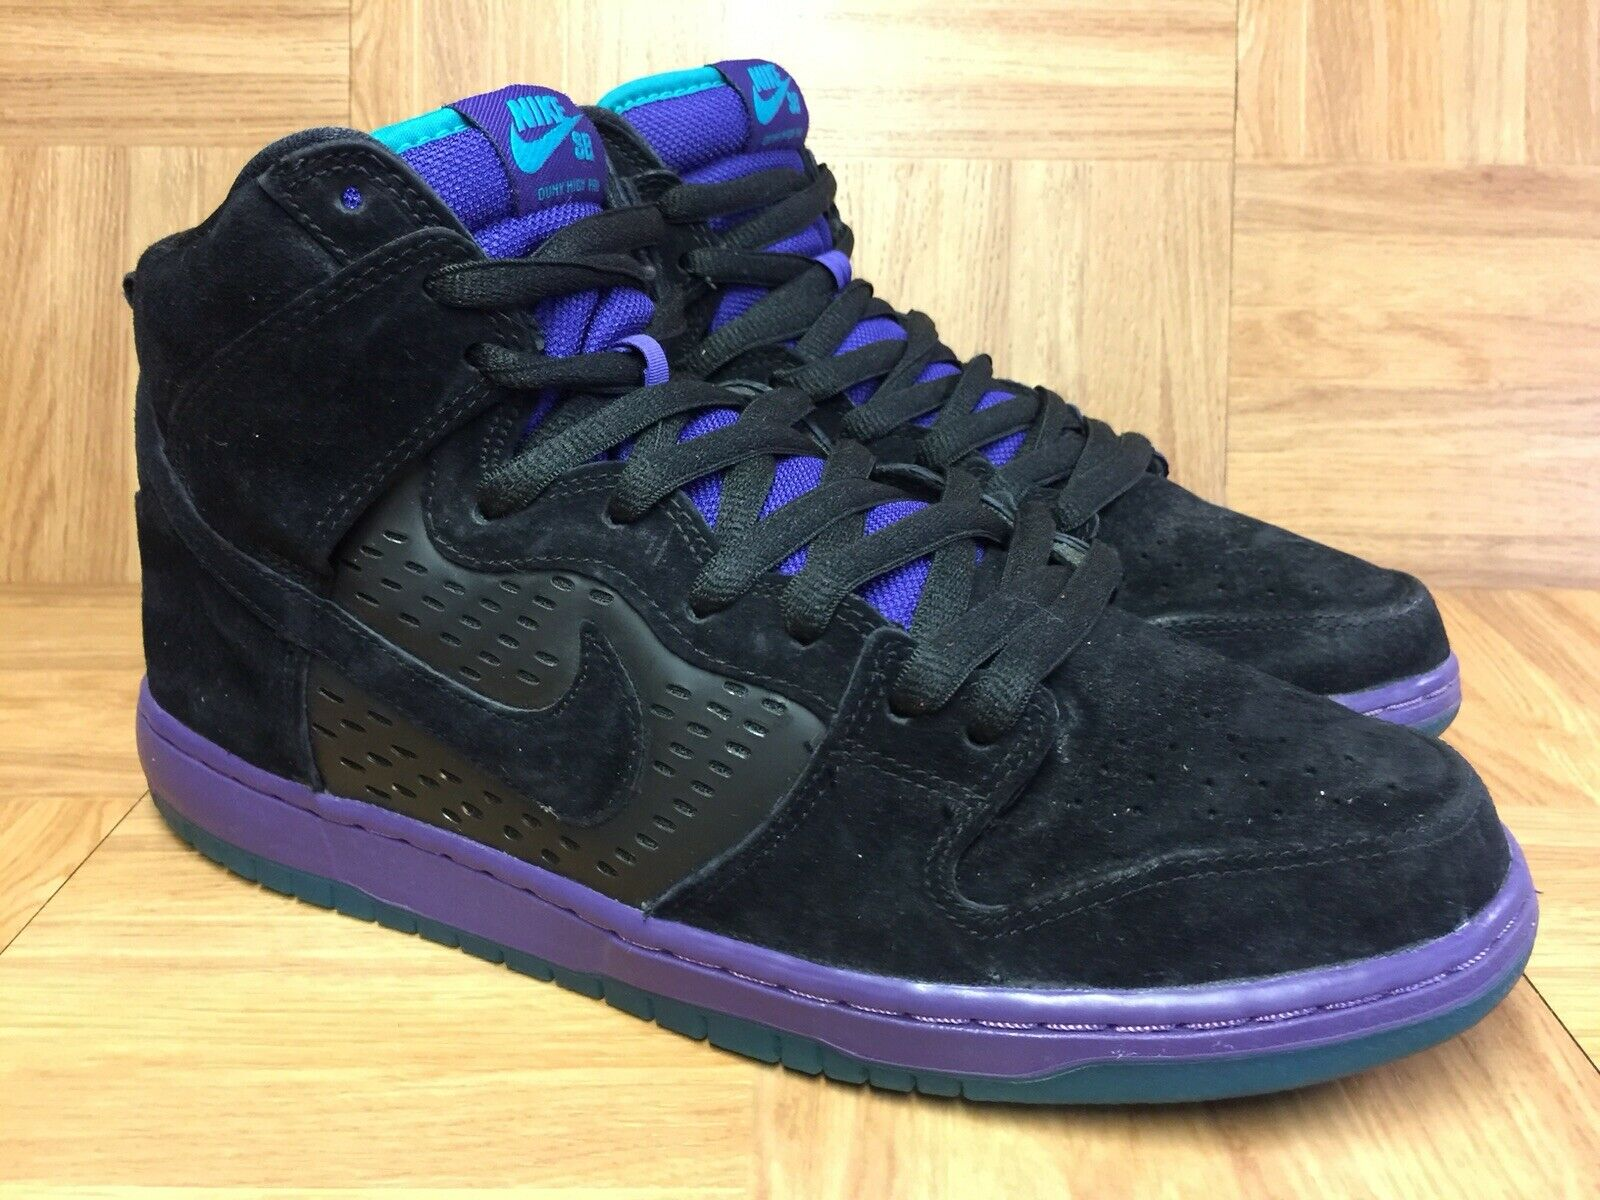 RARE Nike Dunk High Pro SB Black Grape Premium Ice Emerald Black 11 313171-027